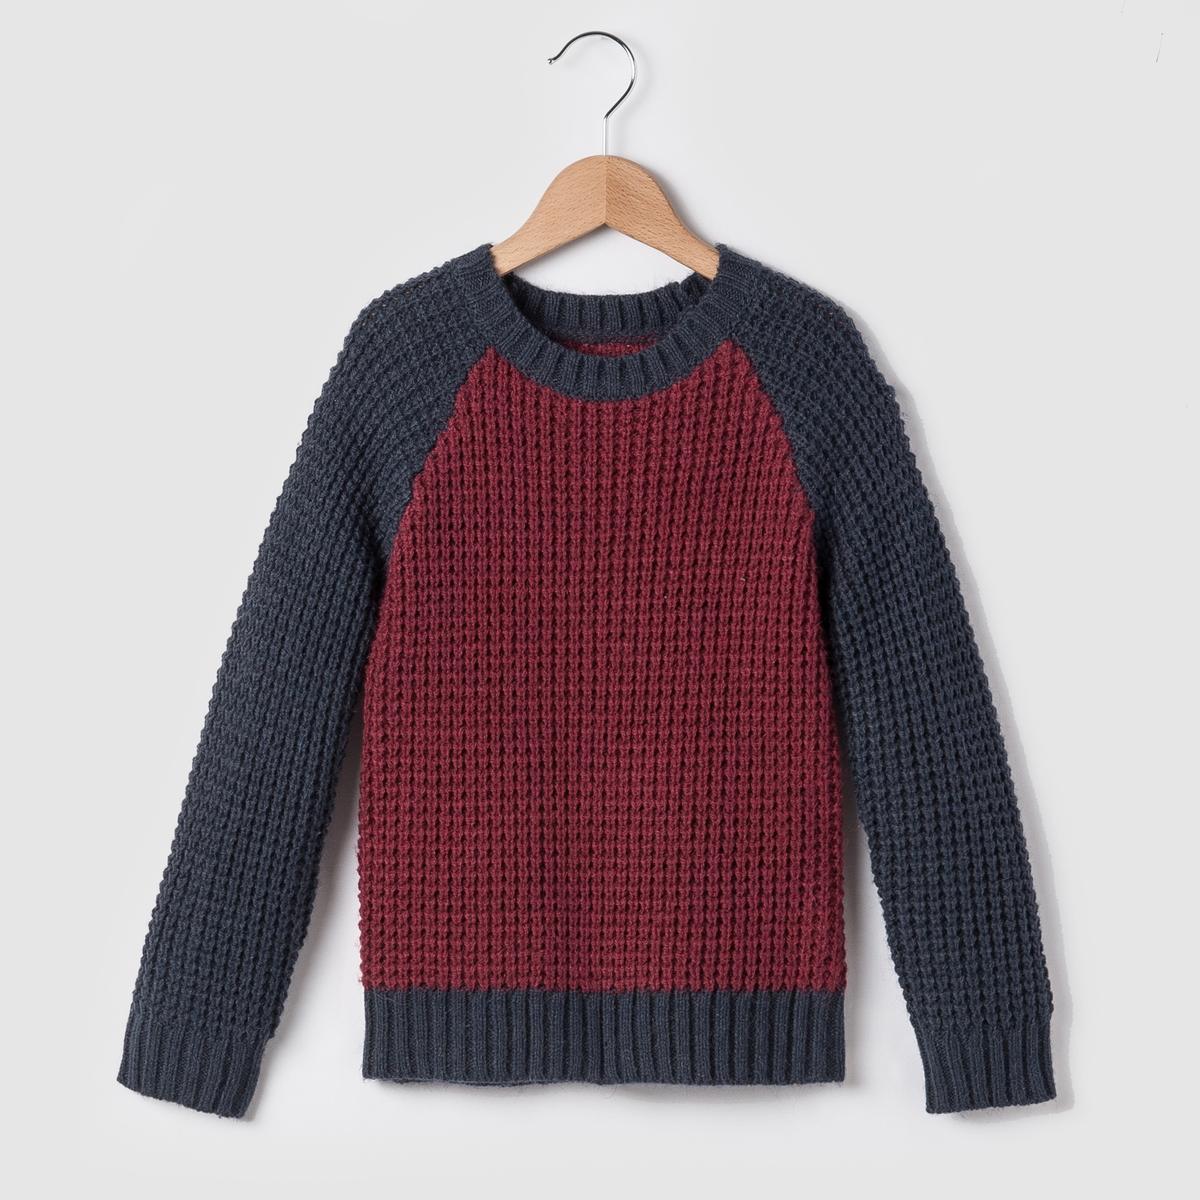 Пуловер тёплый, двухцветный, 3-12 лет